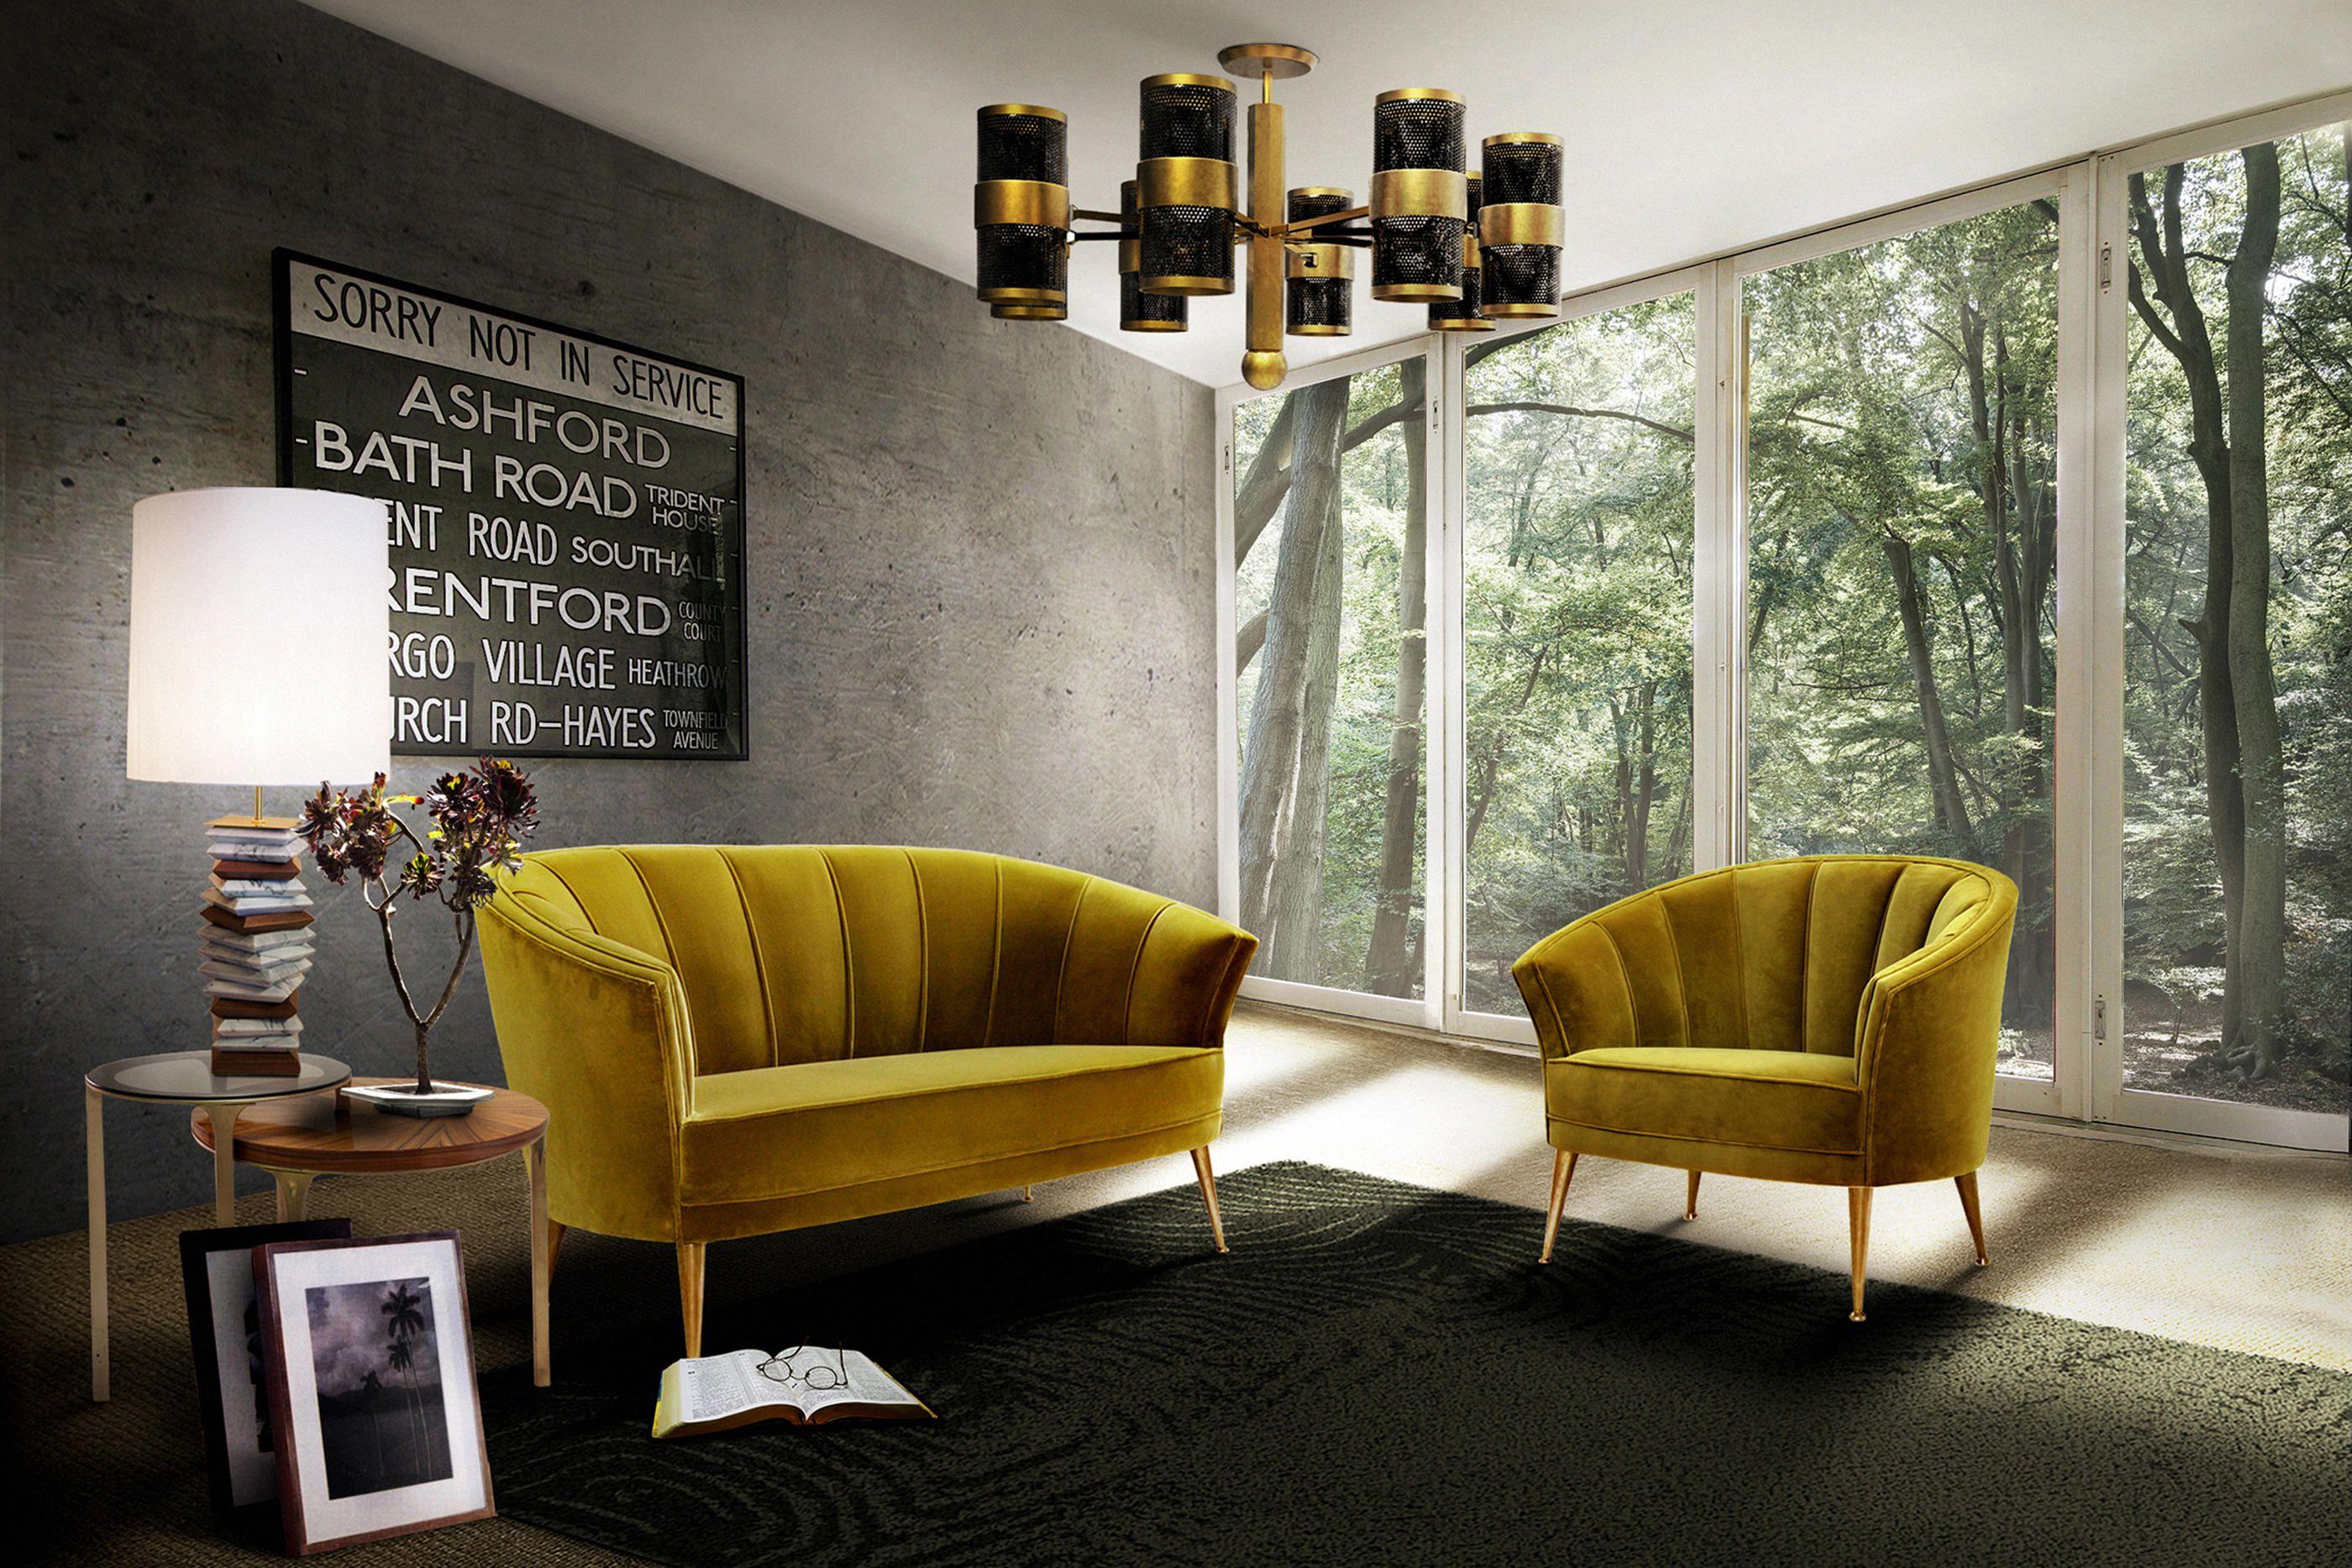 Hochwertige Möbel Designer Möbel Messing Beistelltisch Modernes Design Minimal Luxury Living Room Contemporary Home Furniture Living Room Sets Furniture